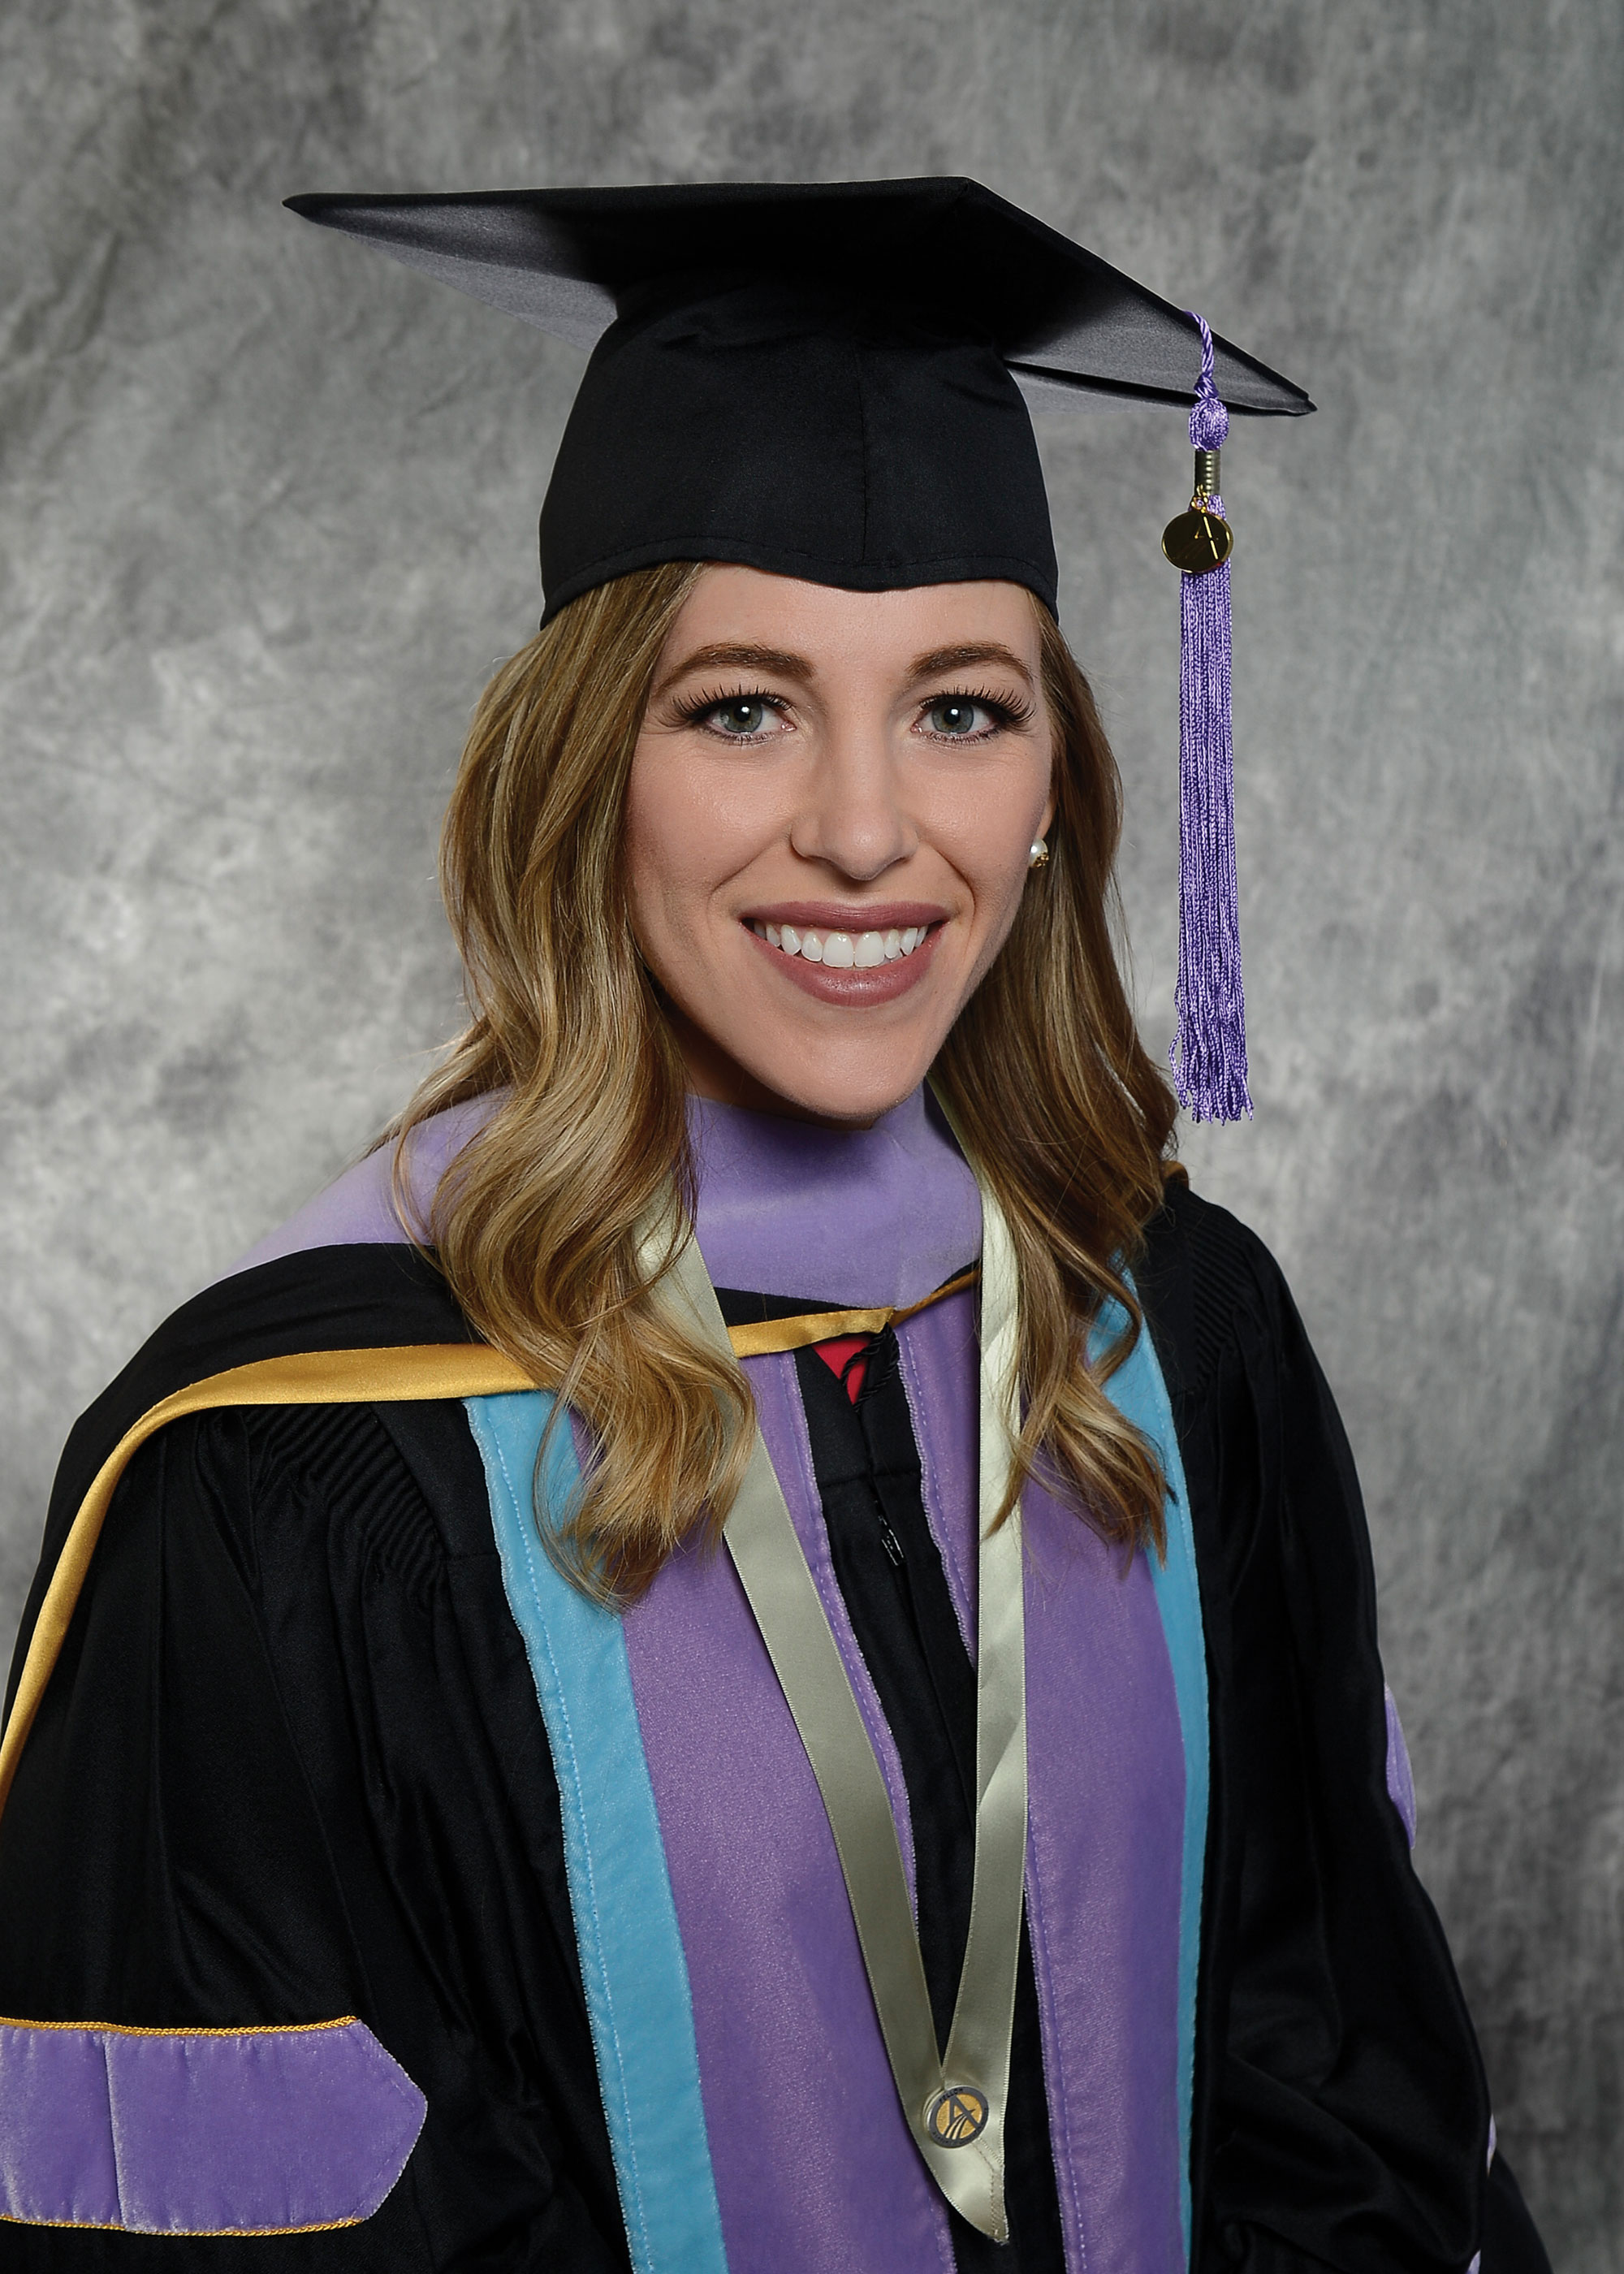 Dr Hartman receives her fagd status